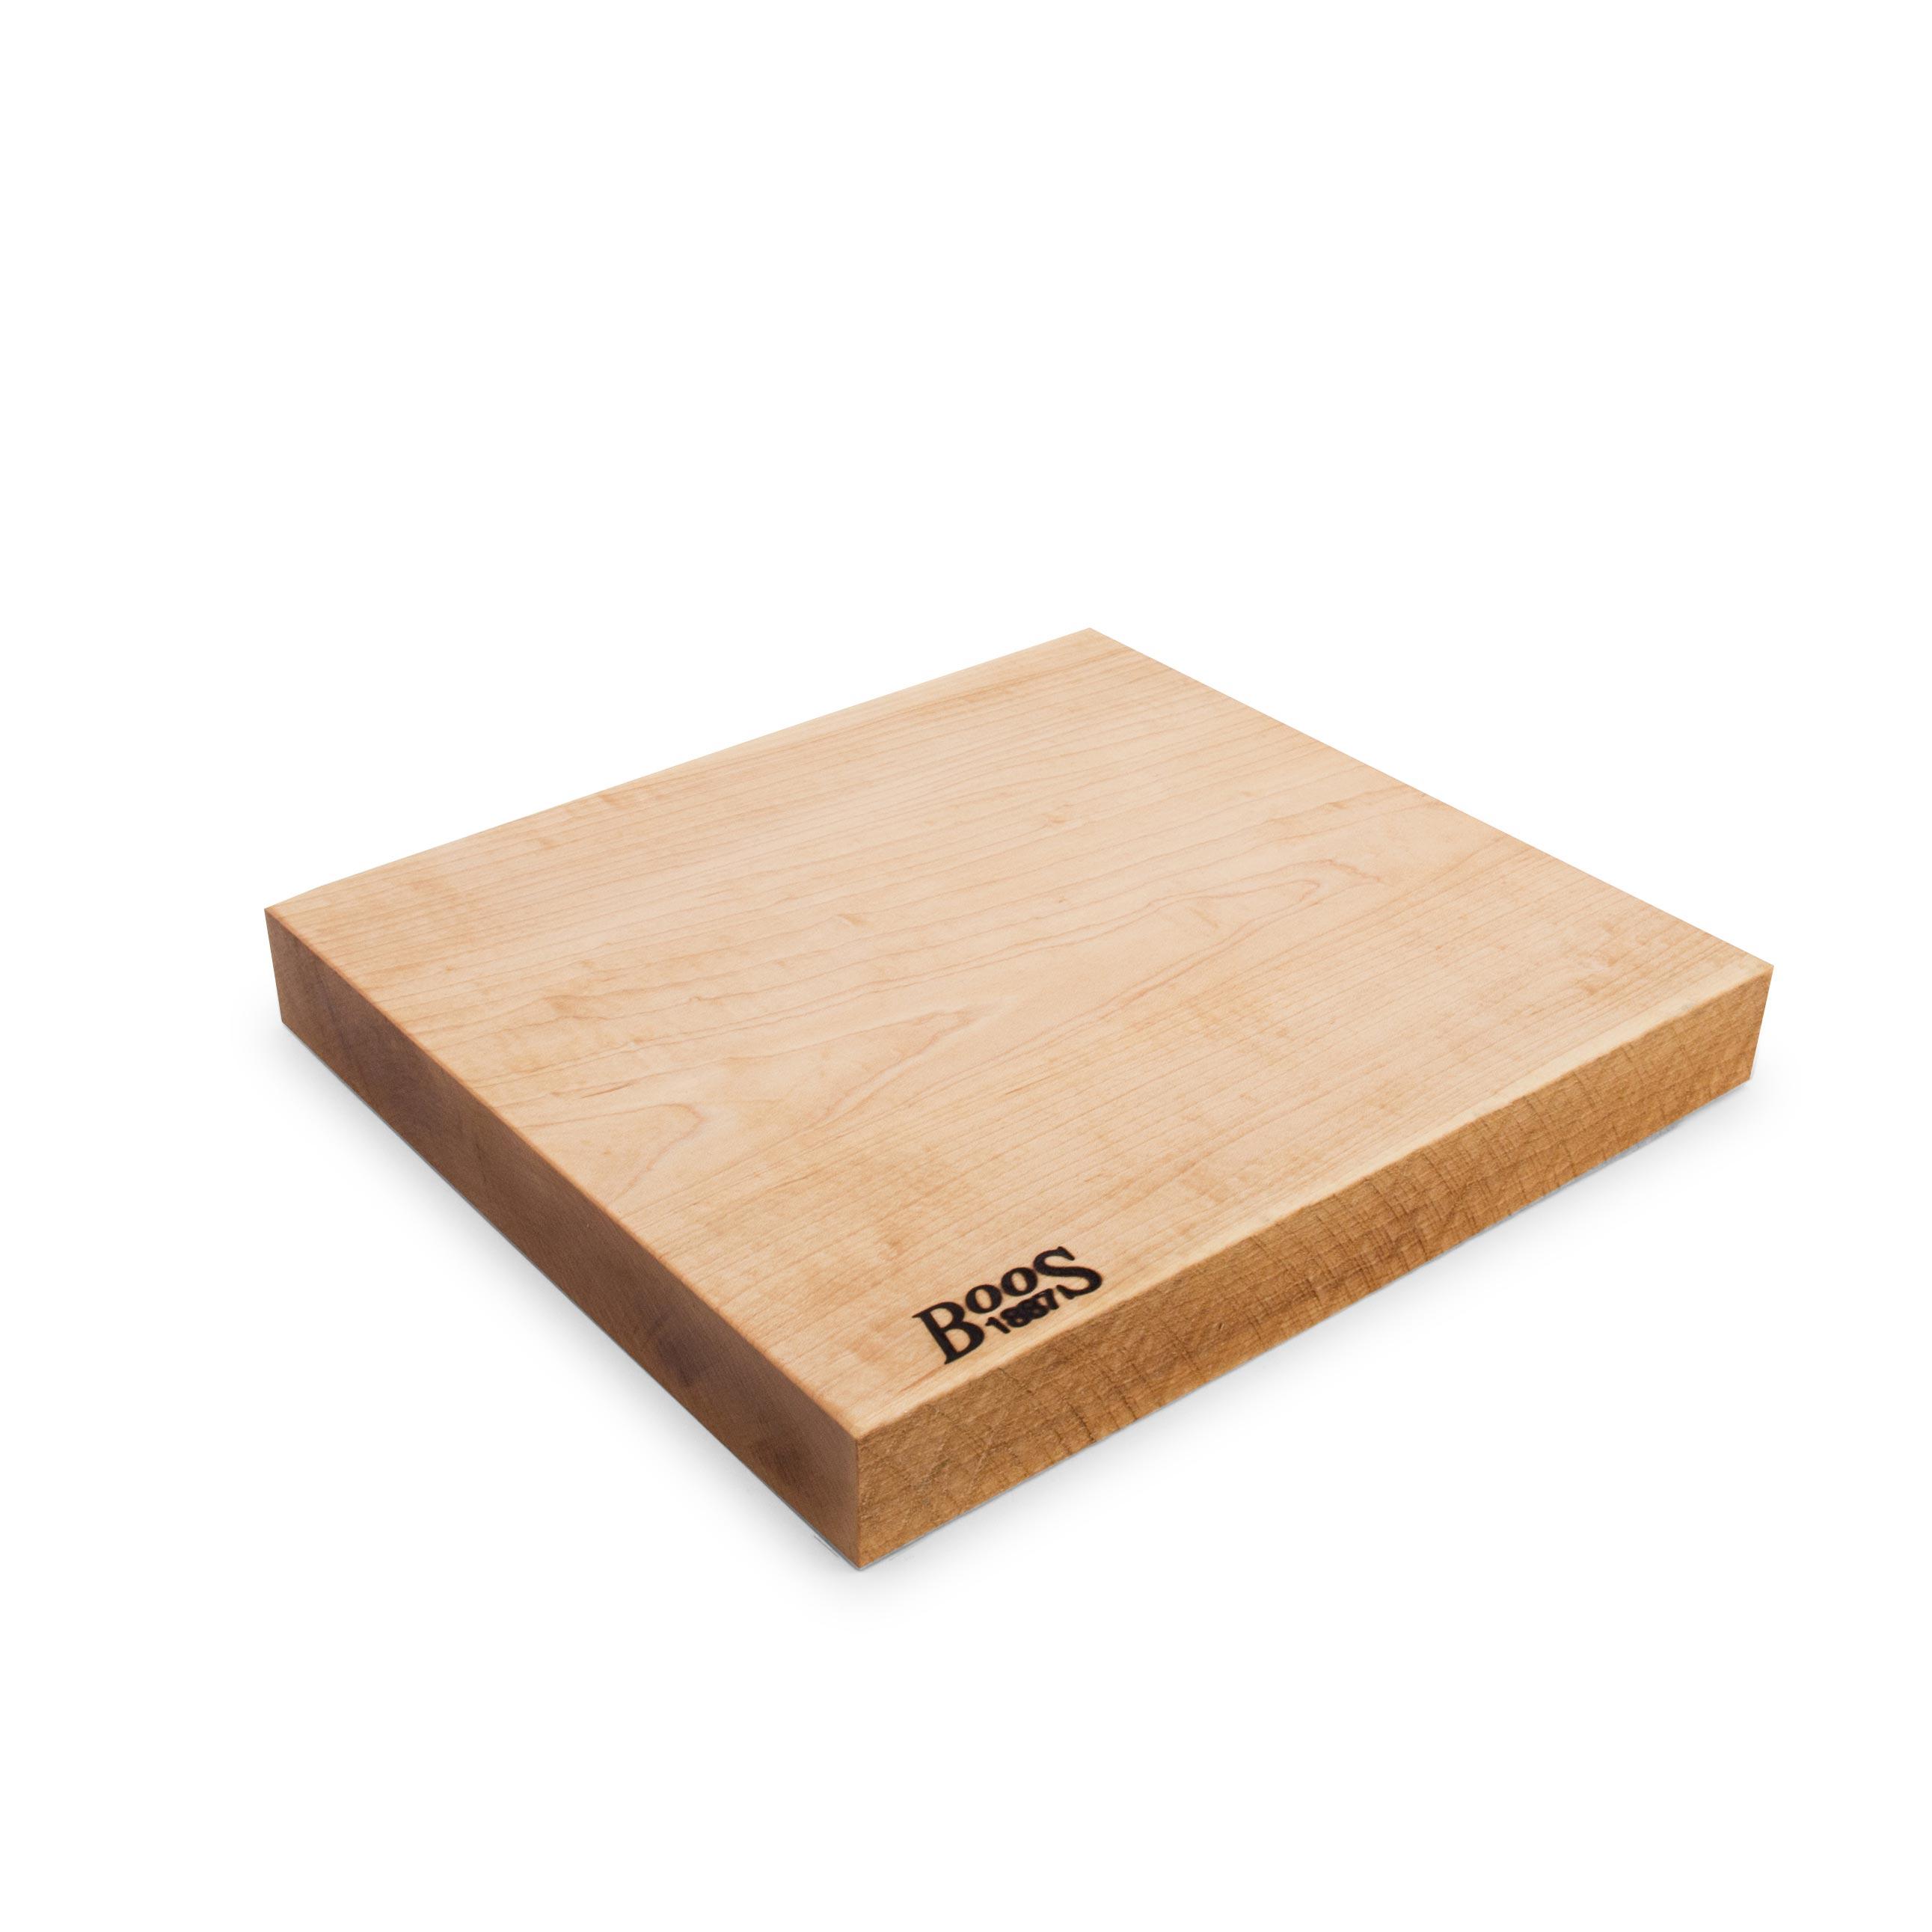 John Boos MPL-RST2112175 cutting board, wood